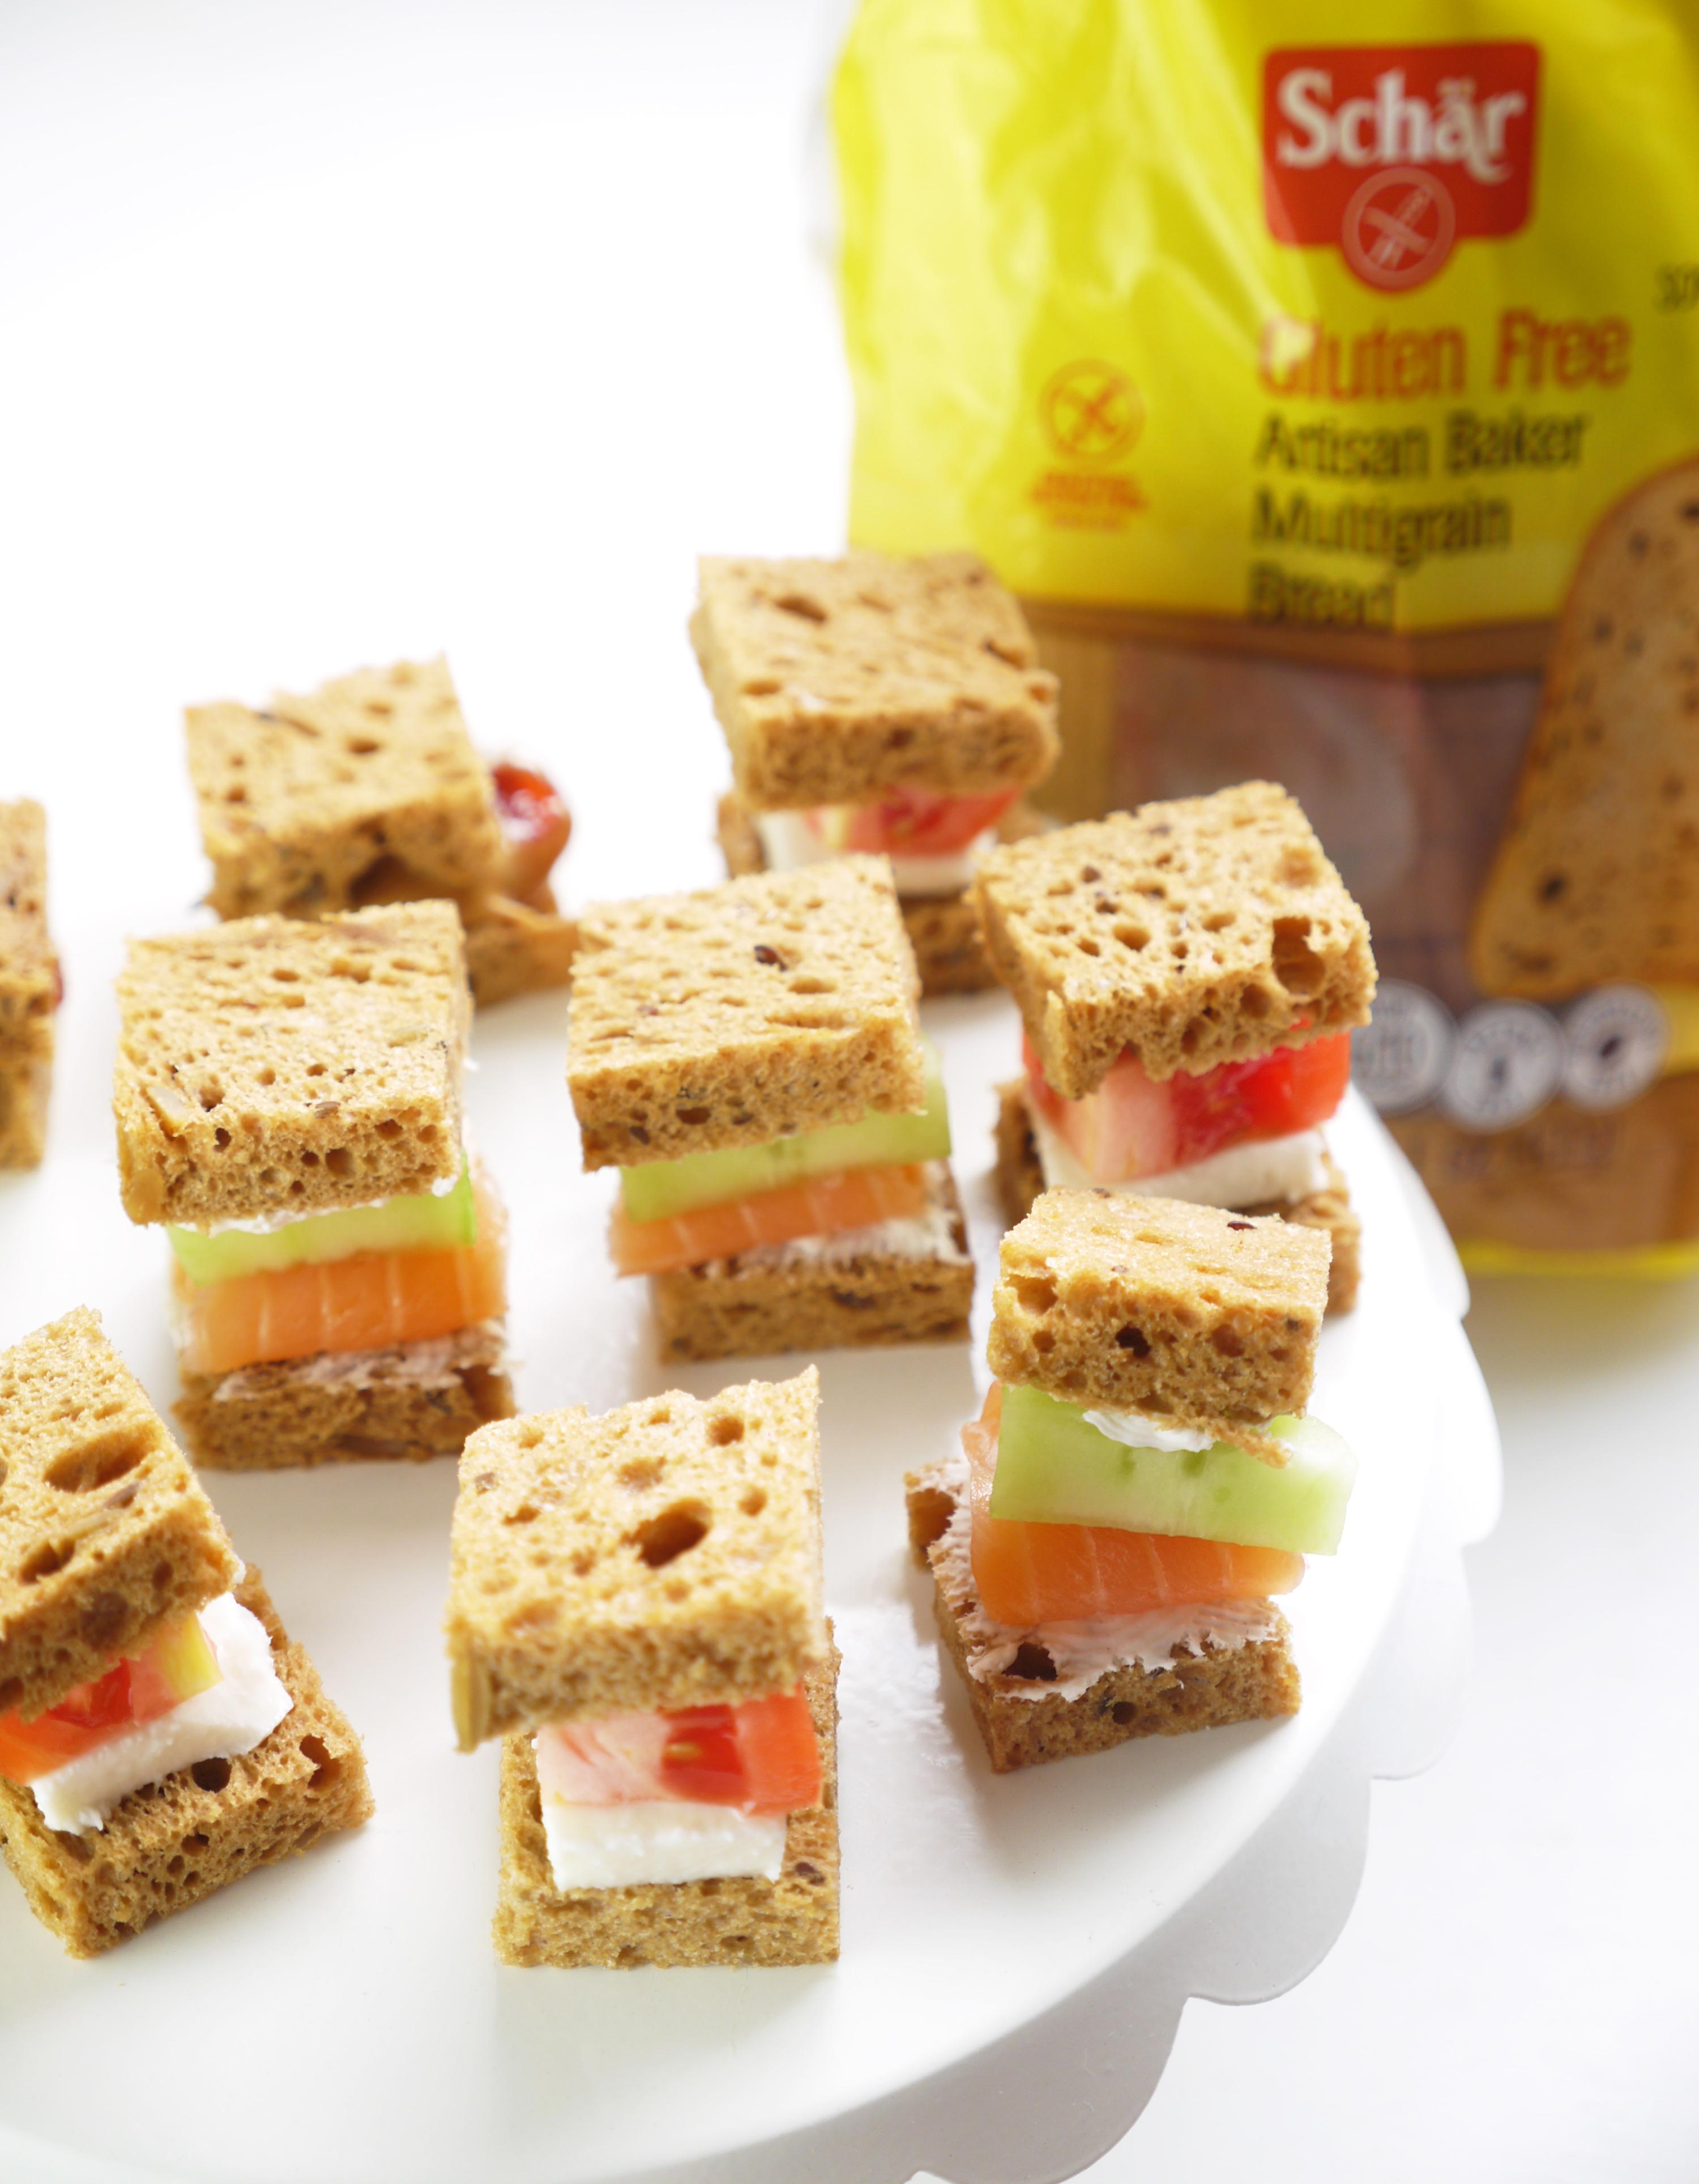 Schar Gluten Free Finger Sandwich